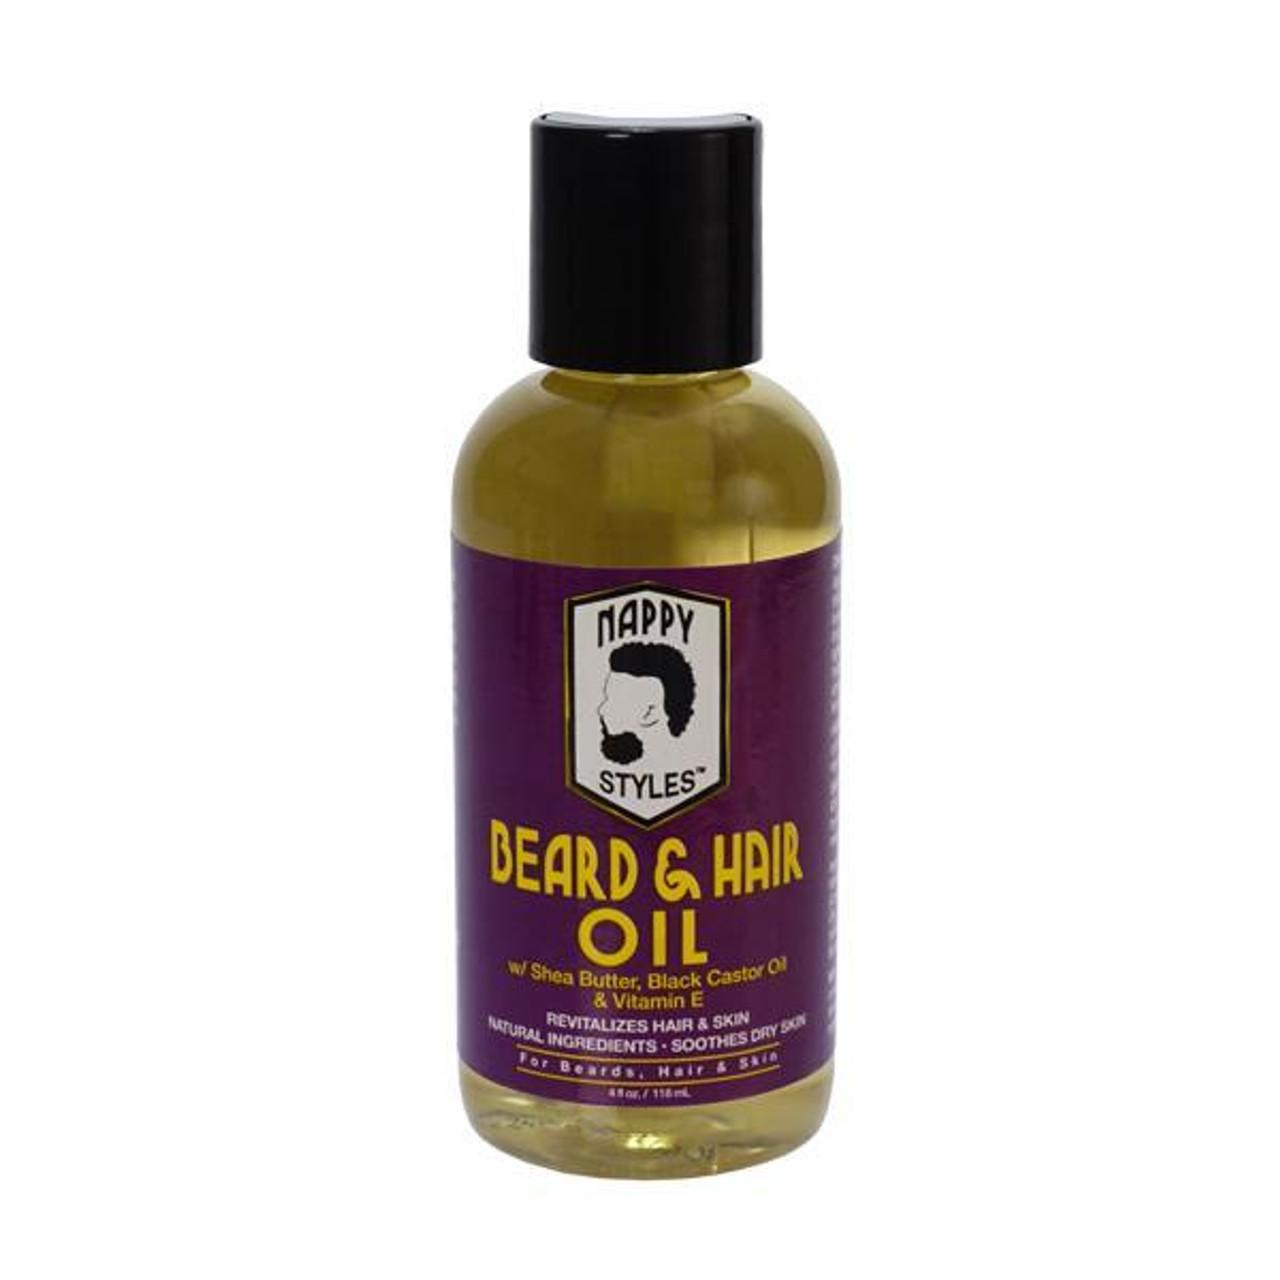 Nappy Styles Beard & Hair Oil